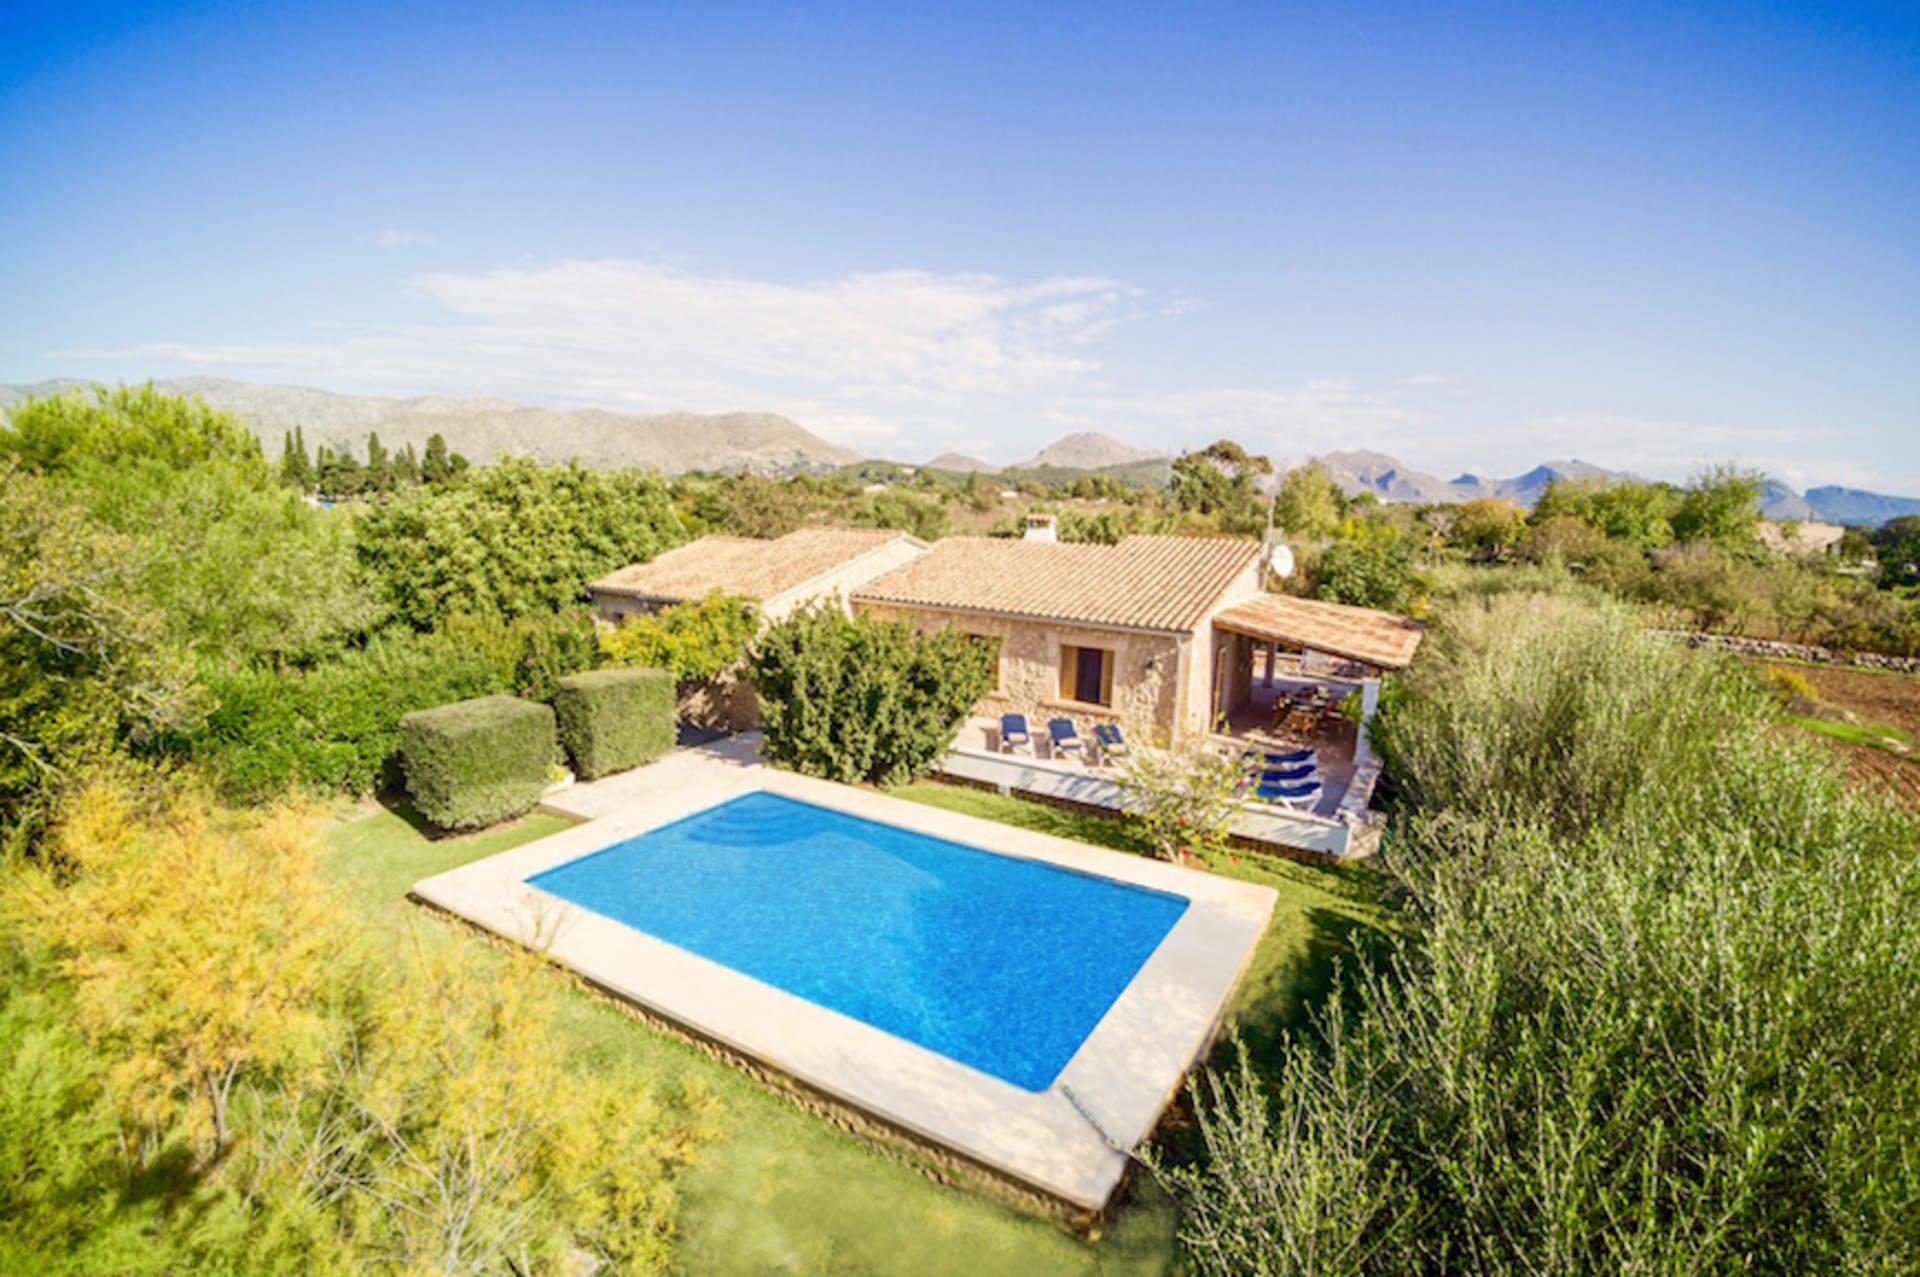 Villa Jordi Fiol, Pollensa, Majorca, Spain